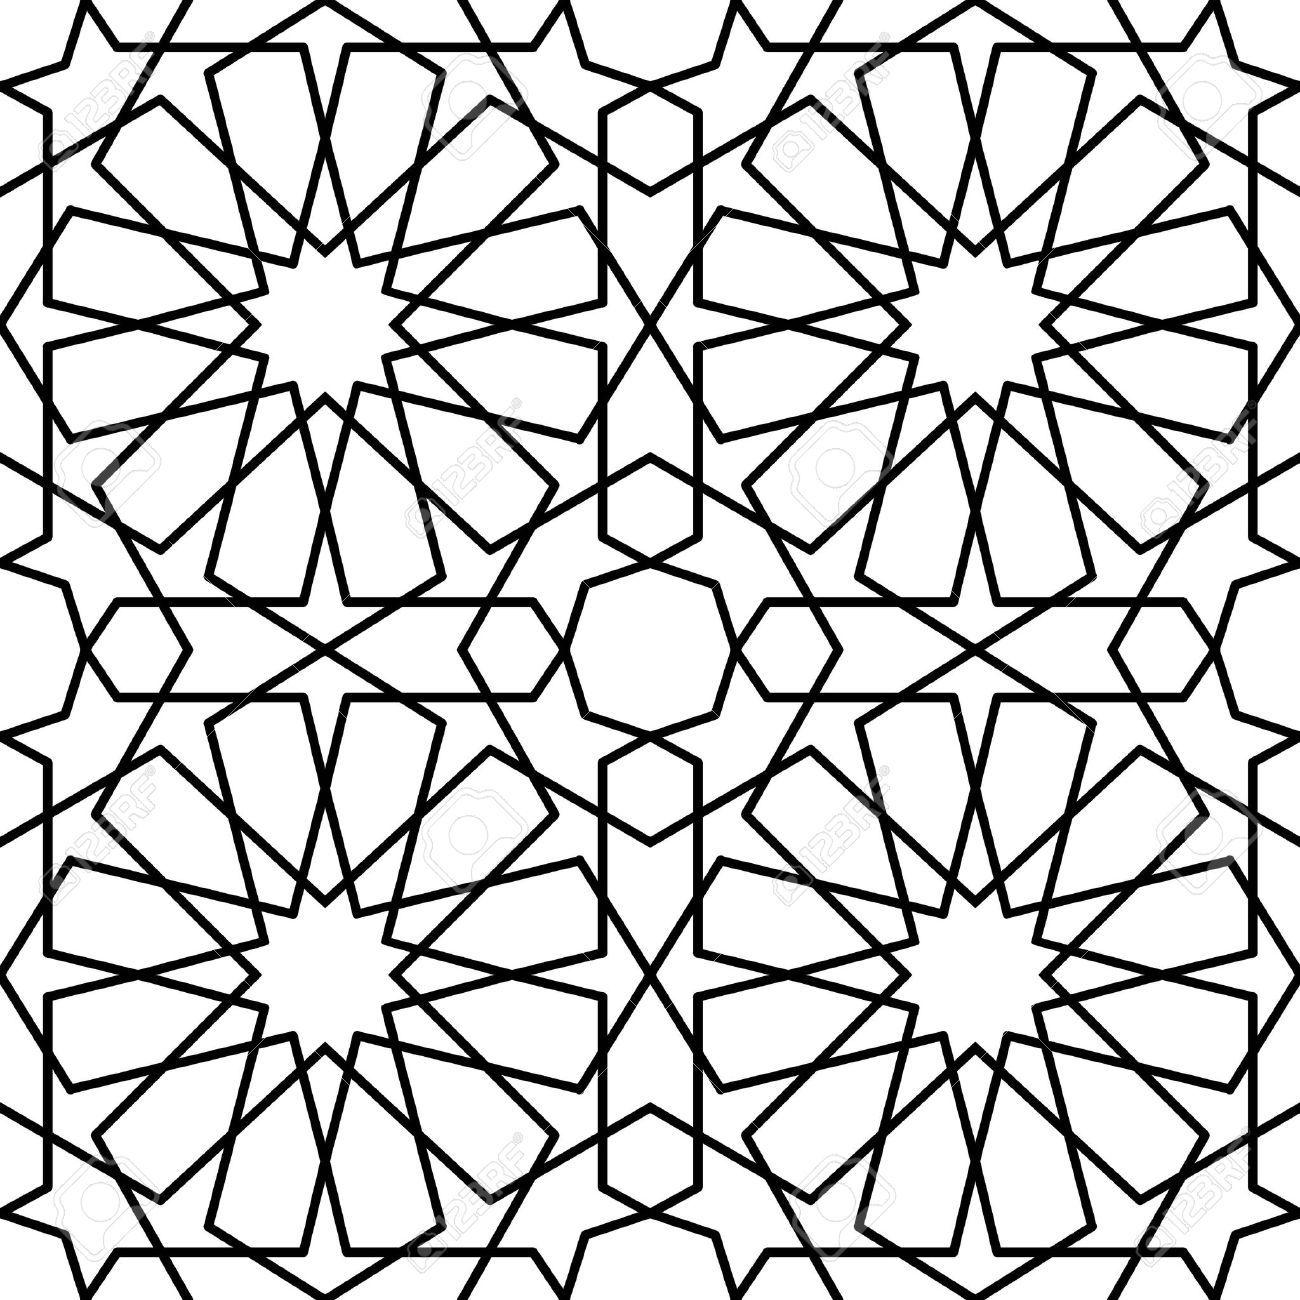 transparente motif g om trique islamique arabe islamic art islamic art pattern arabic. Black Bedroom Furniture Sets. Home Design Ideas